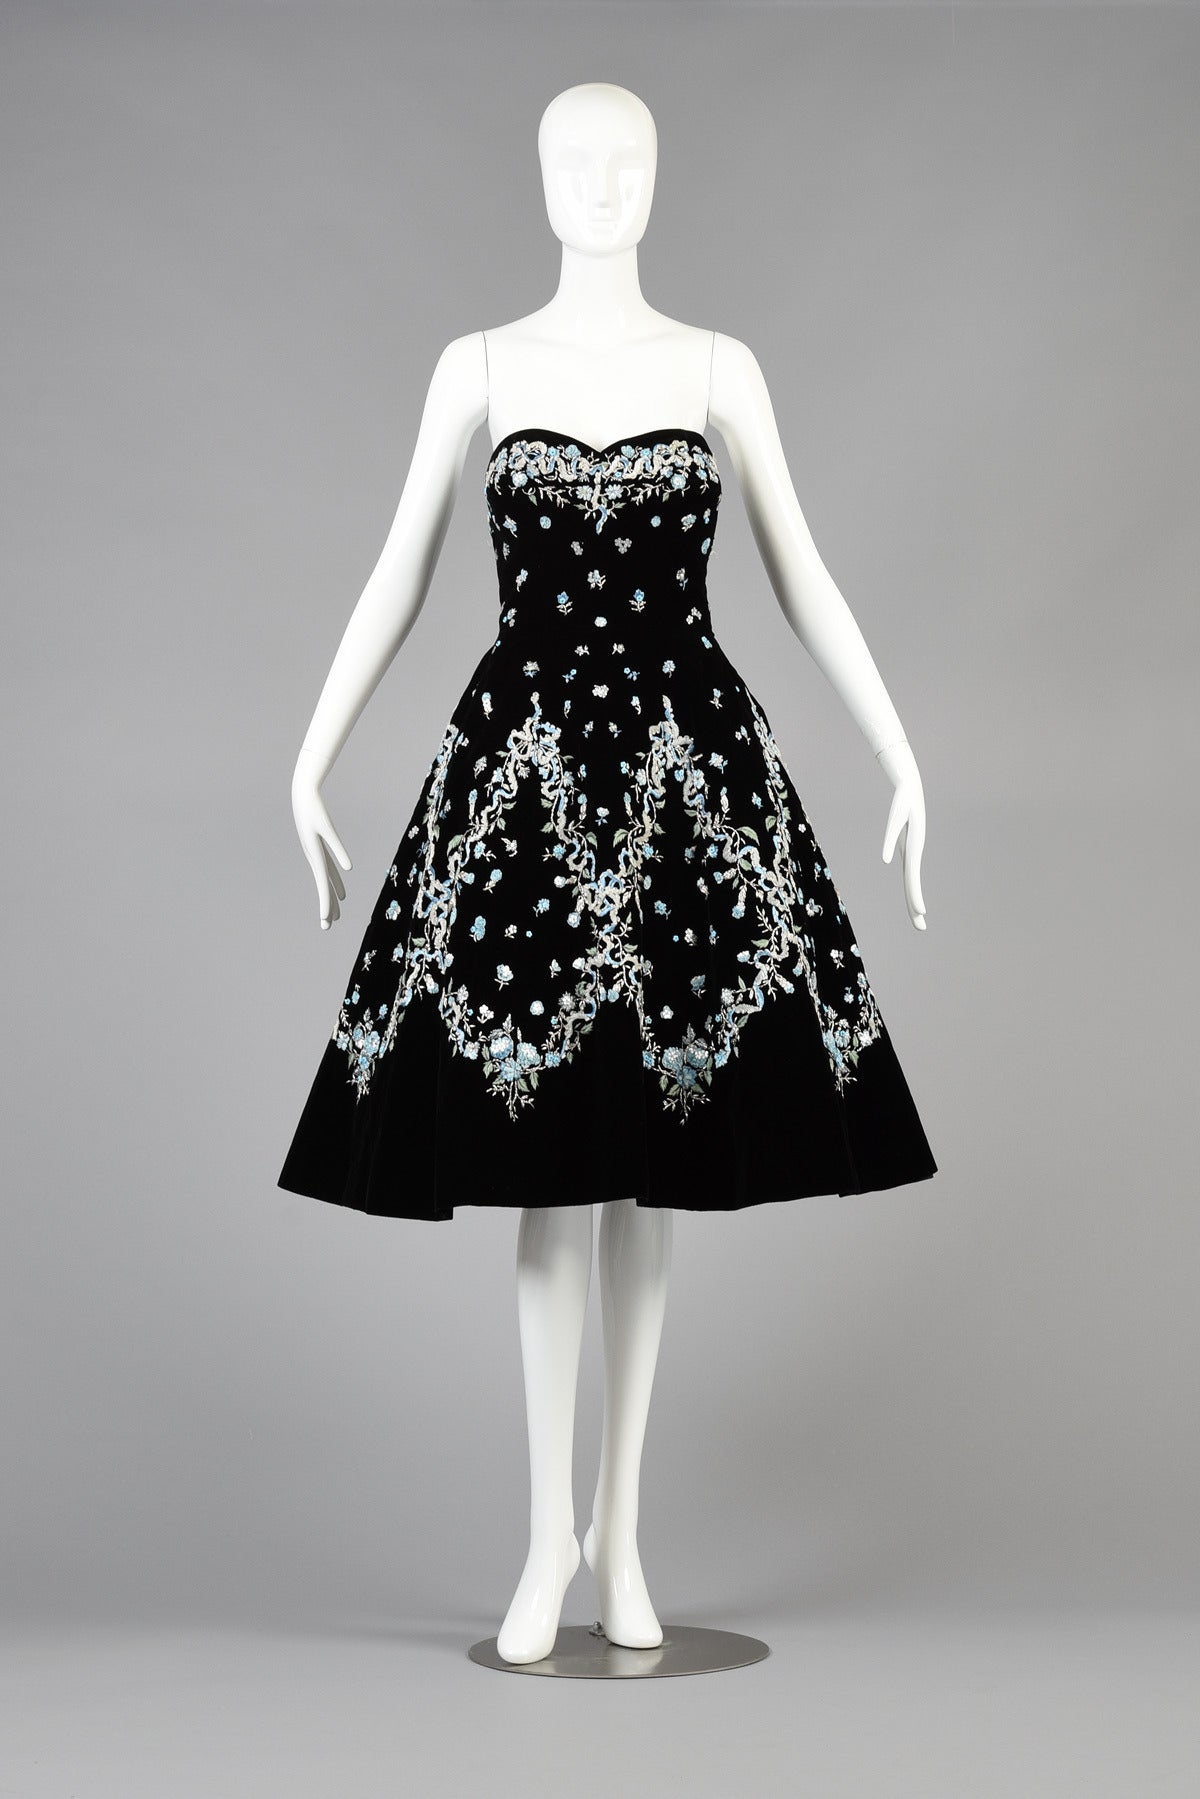 Pierre balmain haute couture cocktail dress with